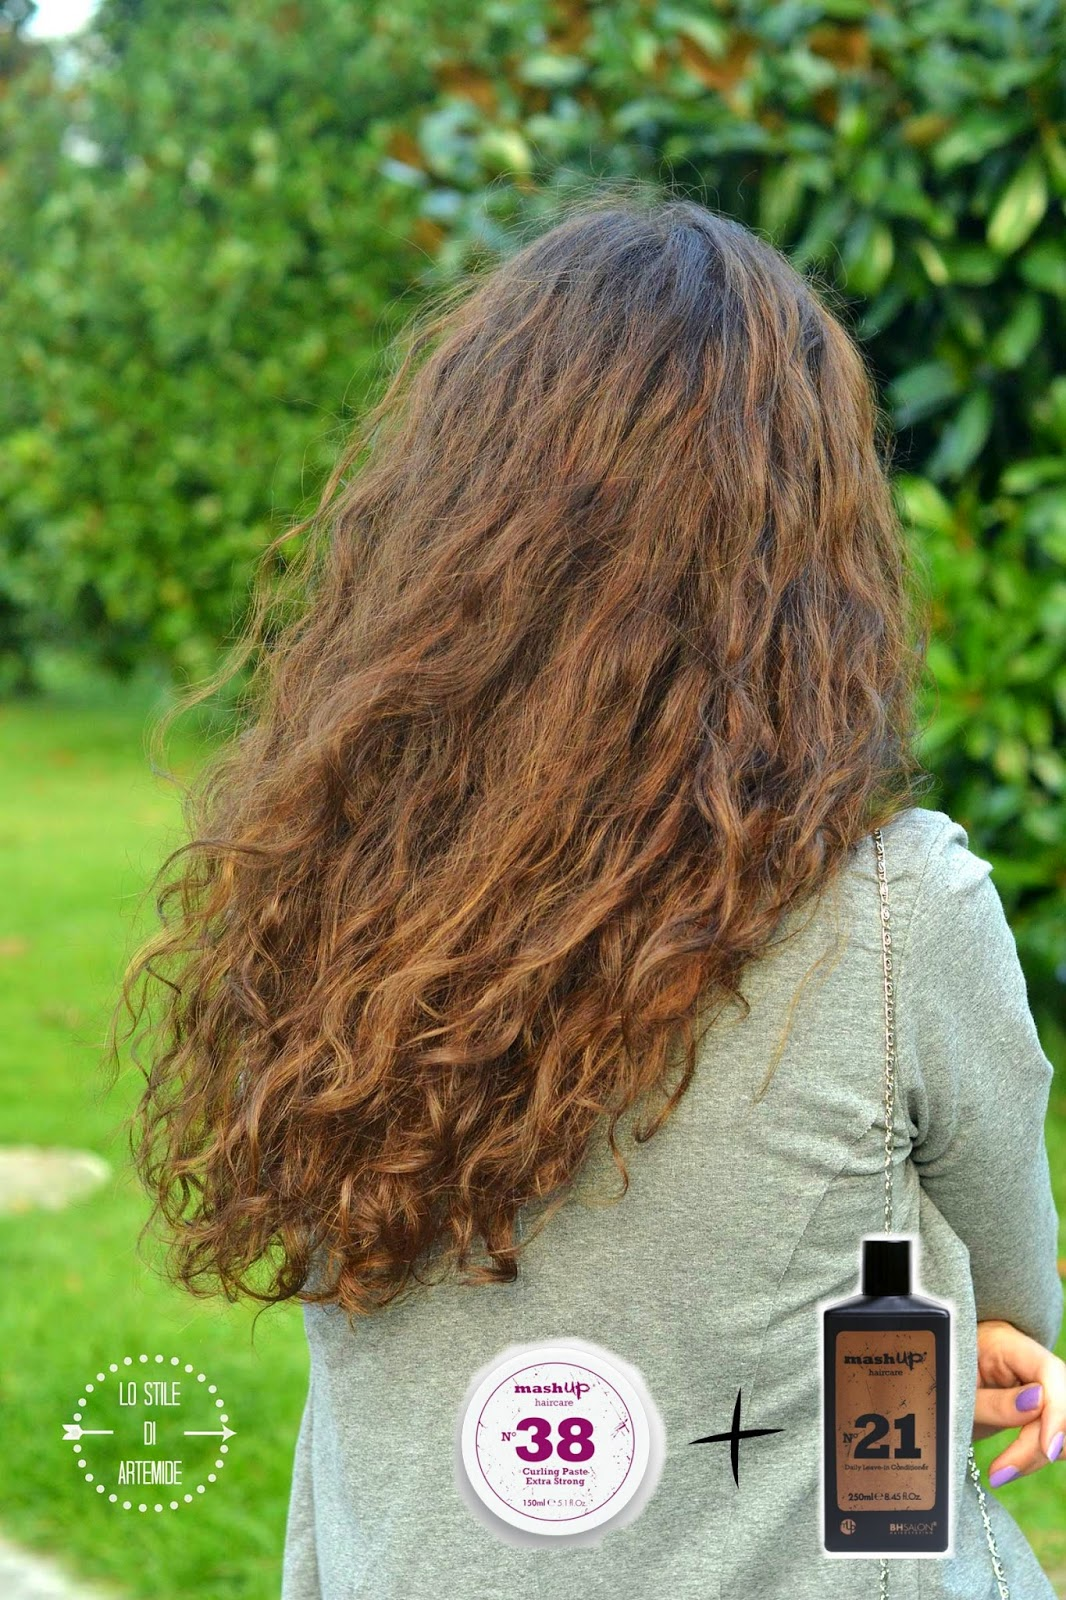 capelli ricci mashup hair care